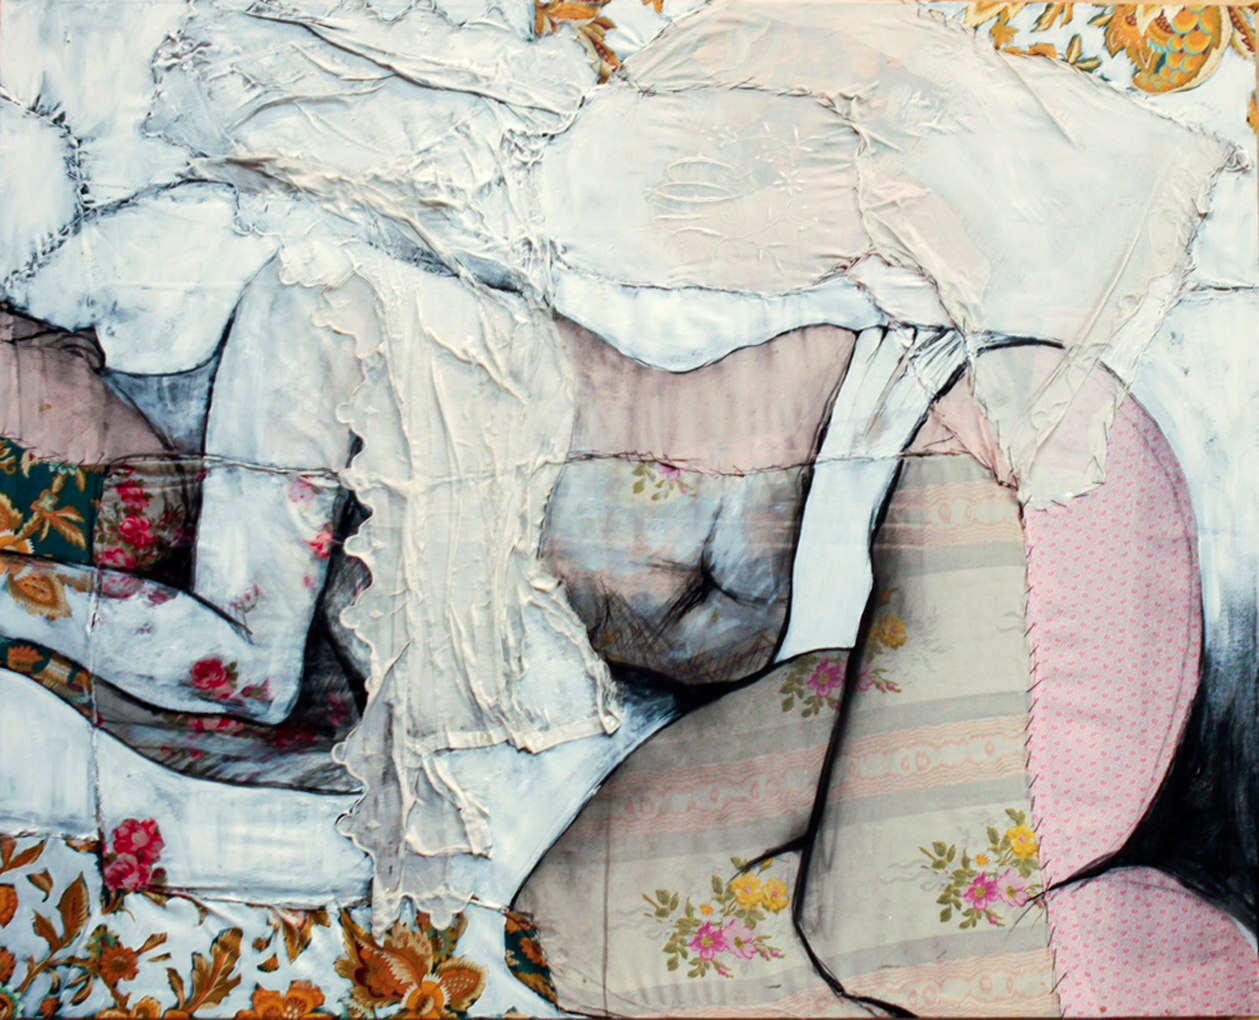 "Lea II  - Fabric, sheets, stitching, charcoal, mixed media on canvas - 32"" x39"" / 80 x 100 cm"